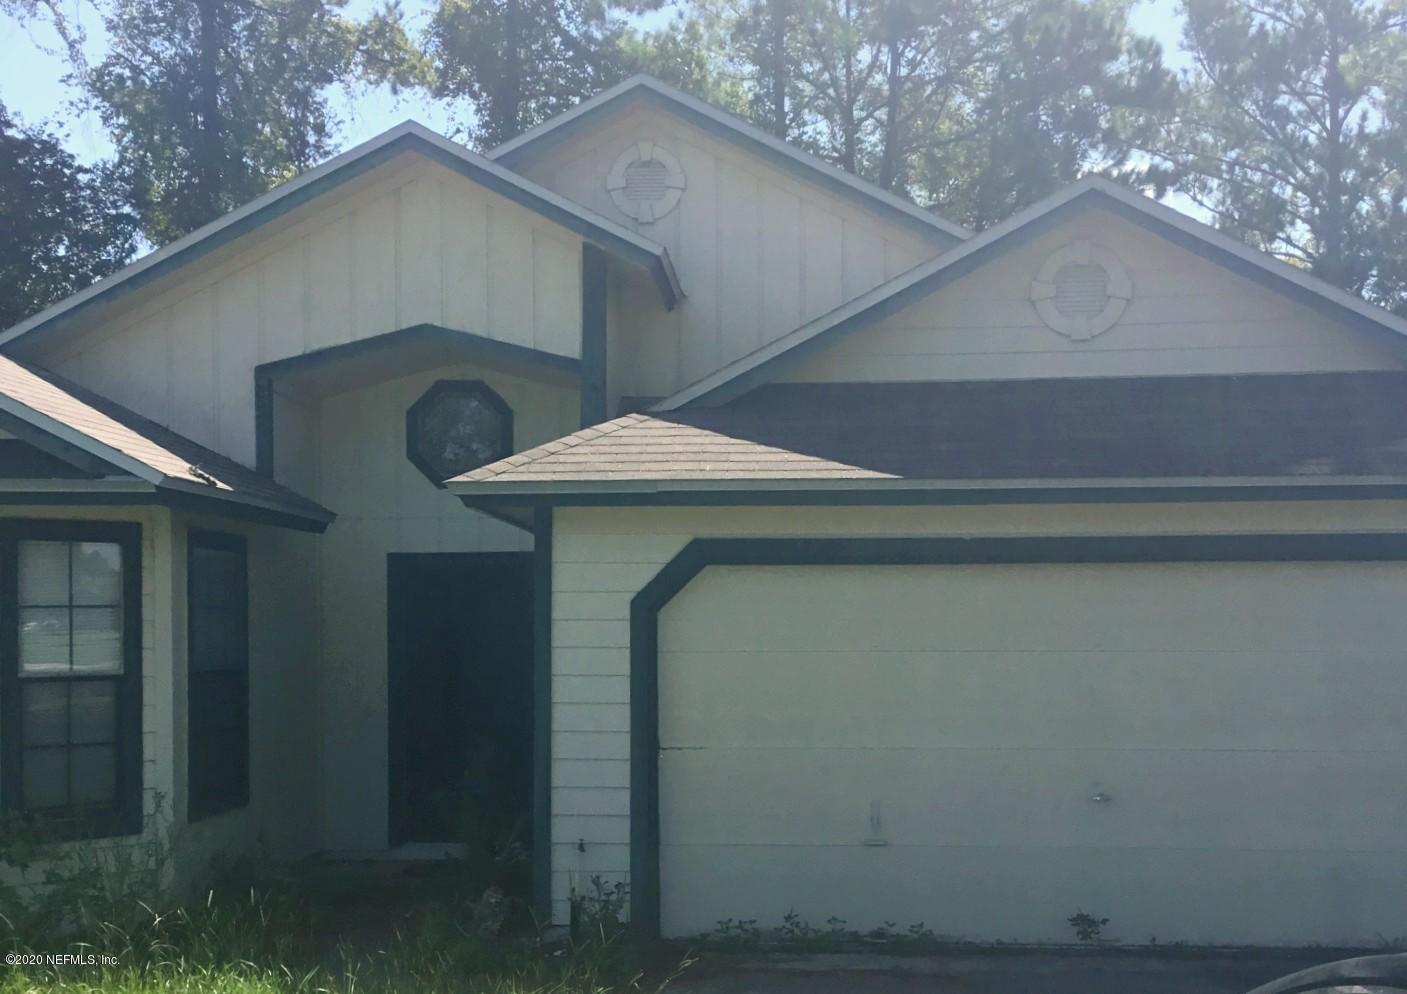 7835 COLLINS RIDGE, JACKSONVILLE, FLORIDA 32244, 3 Bedrooms Bedrooms, ,2 BathroomsBathrooms,Rental,For Rent,COLLINS RIDGE,1067761